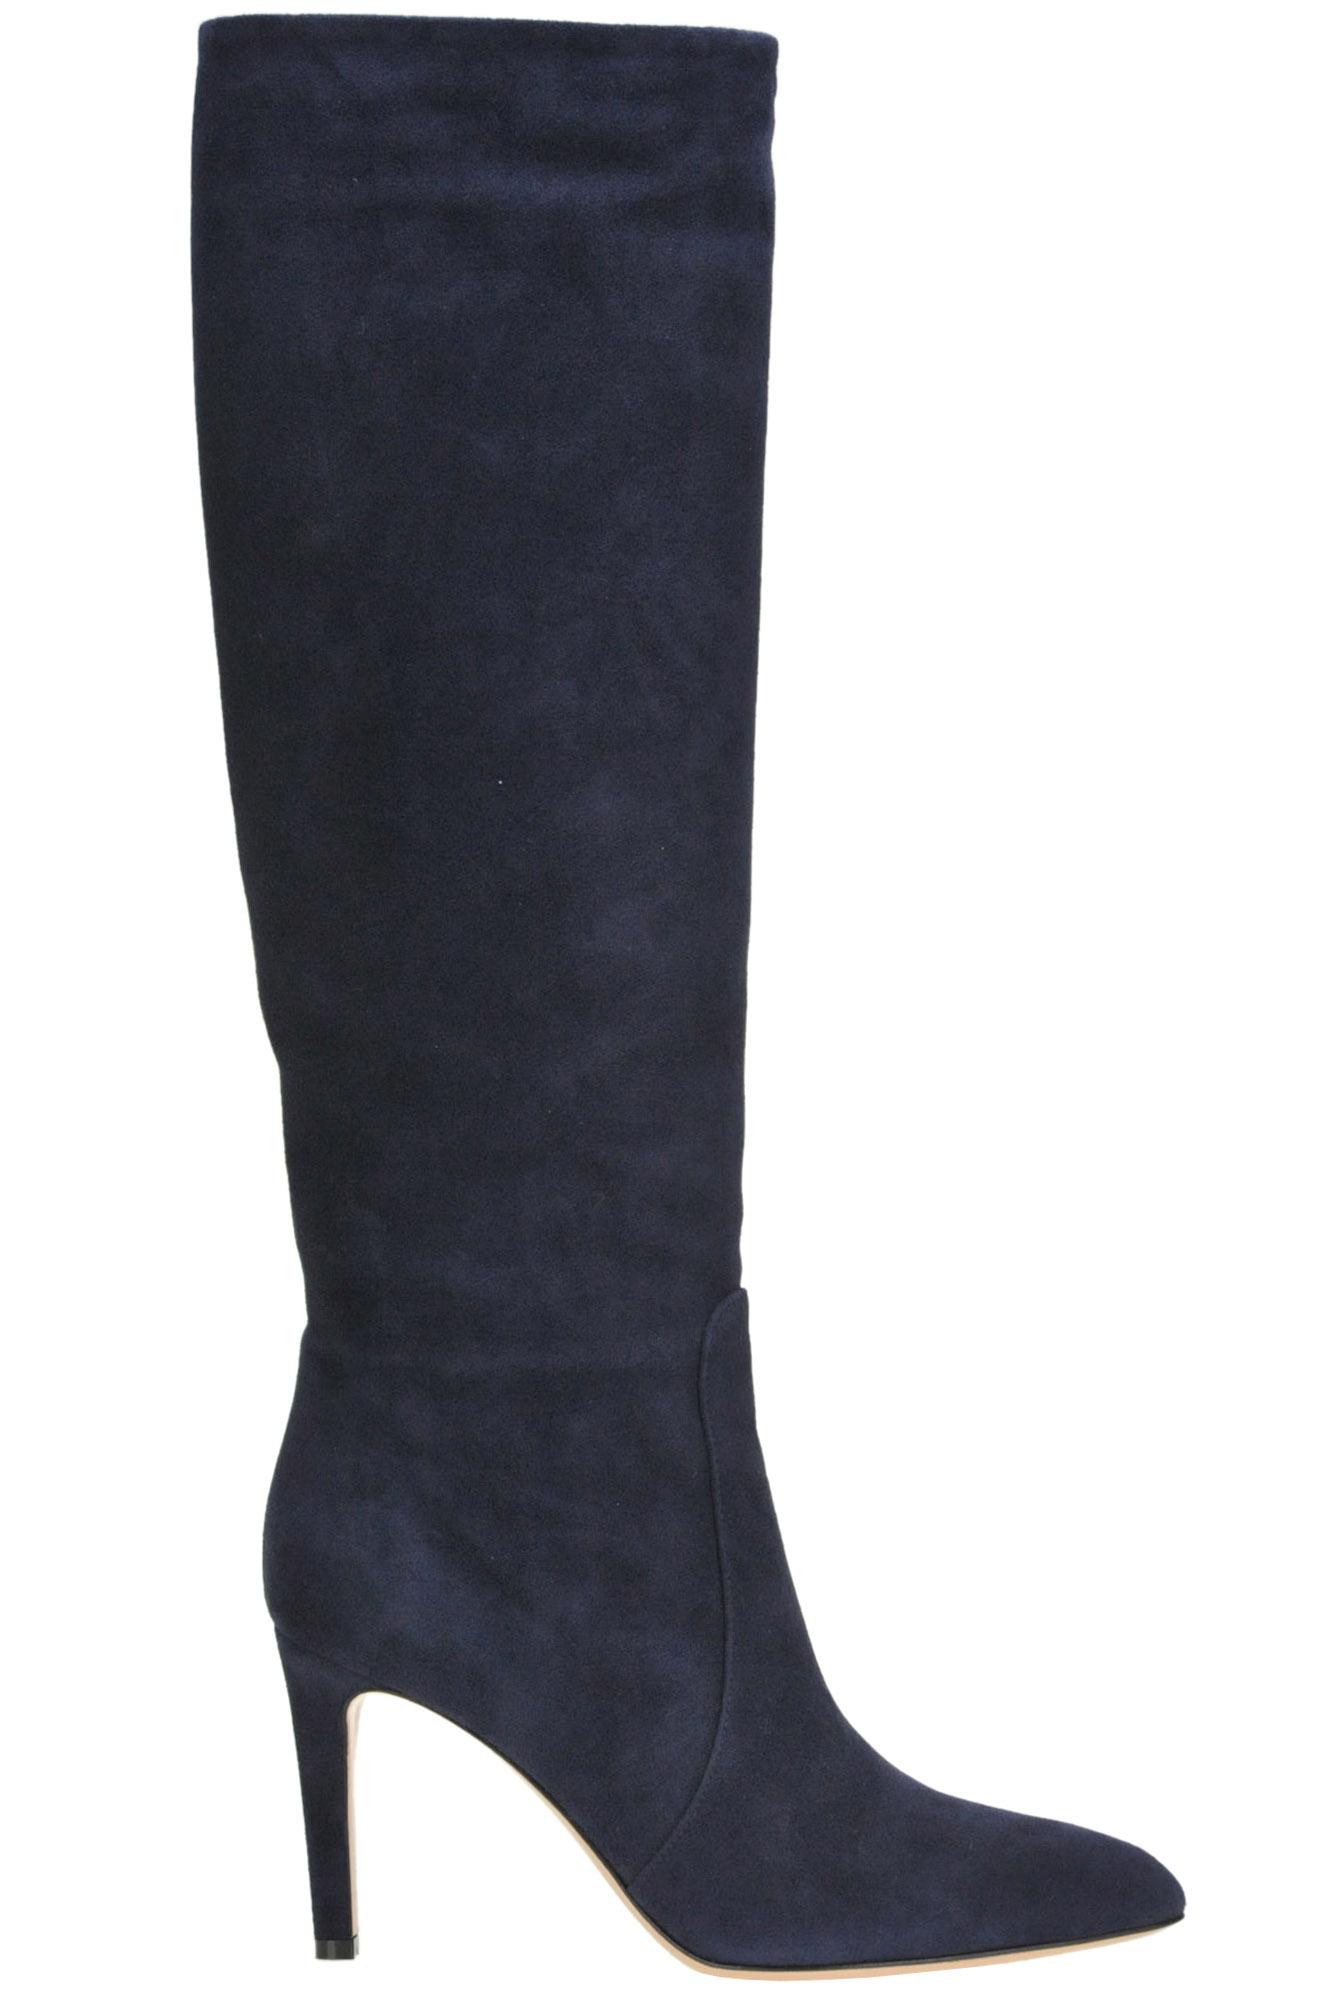 Dana Suede Boots in Navy Blue